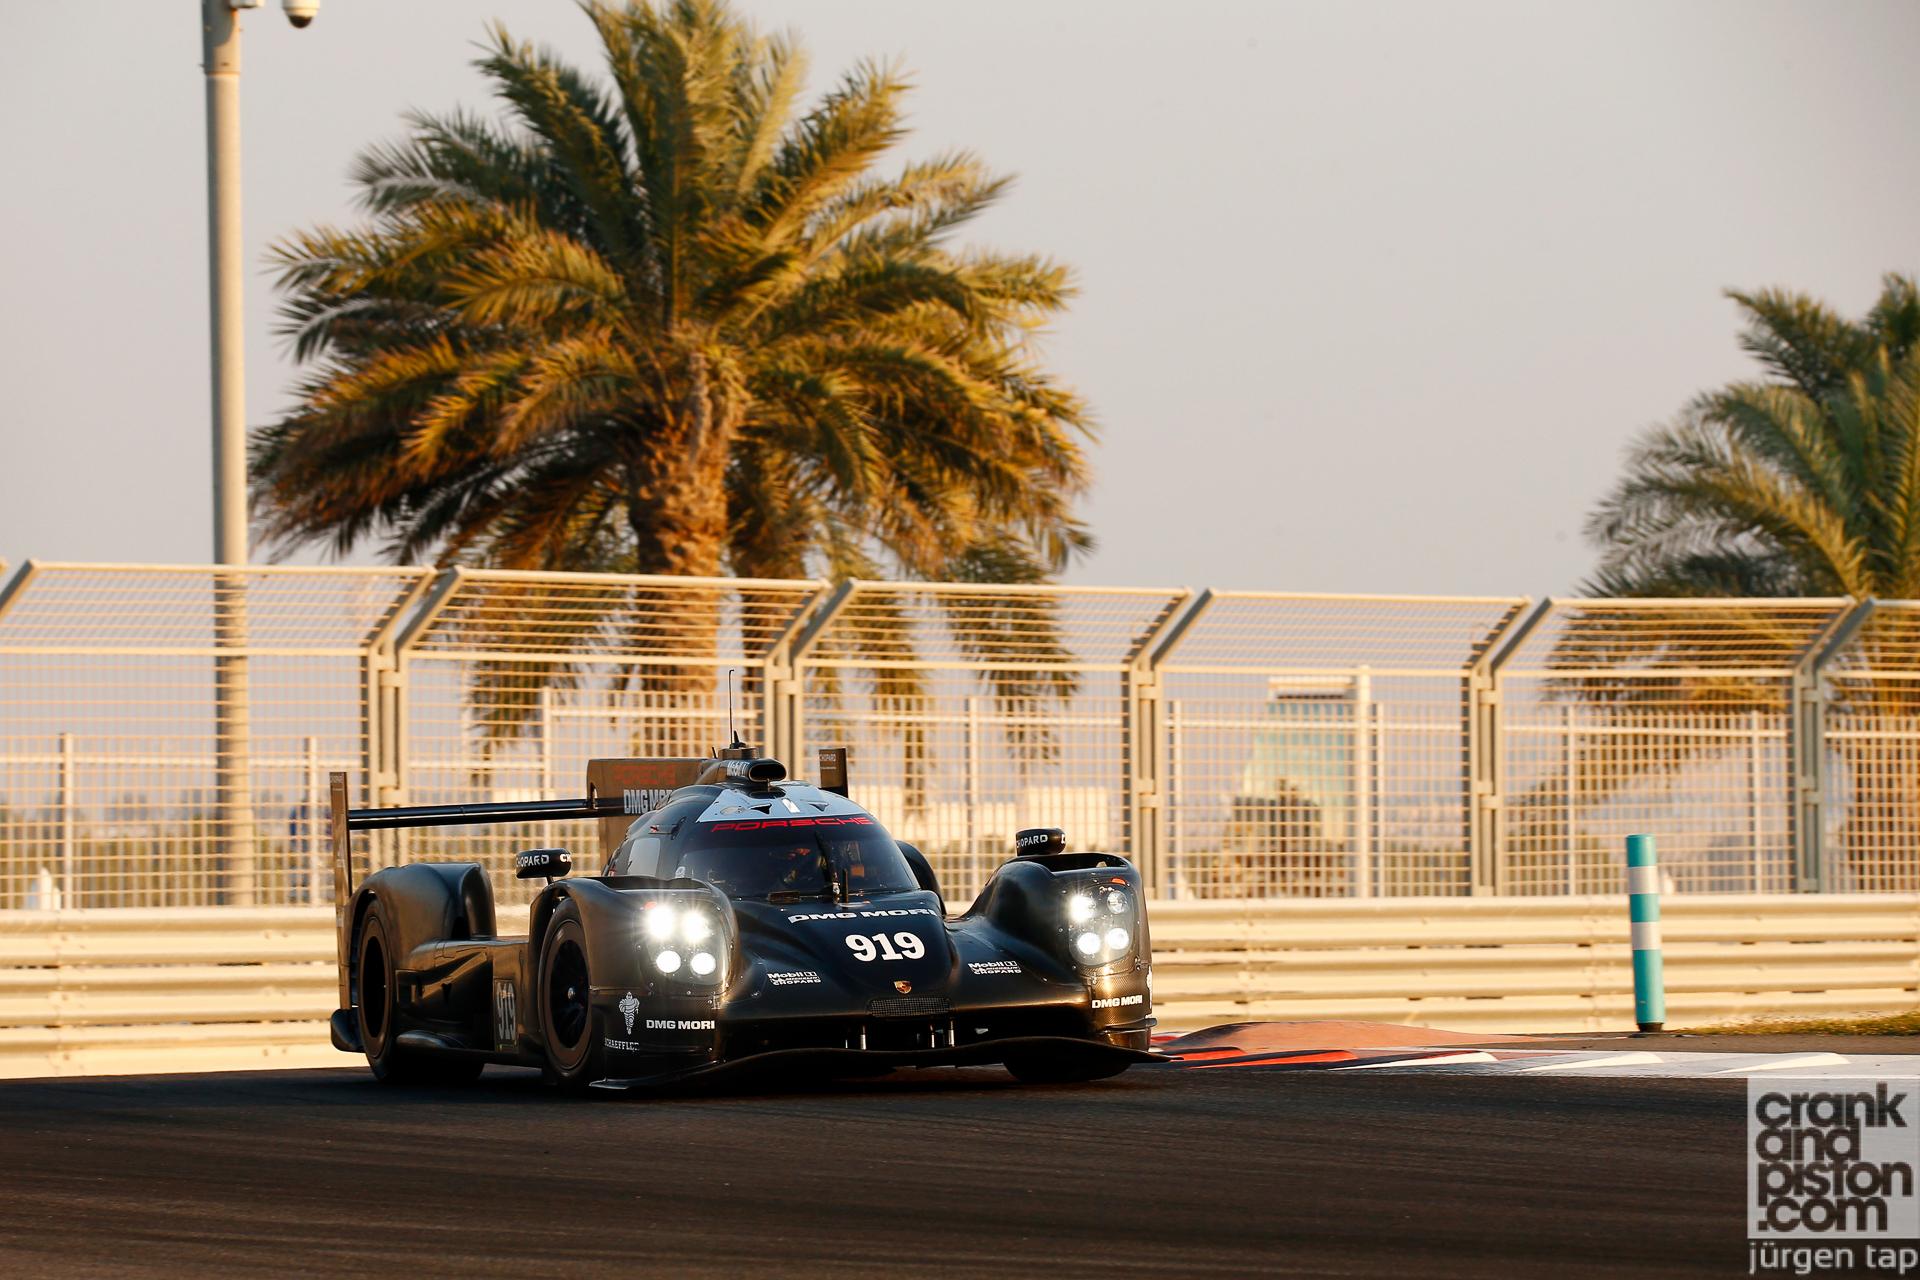 Motorsport Porsche 919 Hybrid Test Abu Dhabi, Yas Marina Circuit